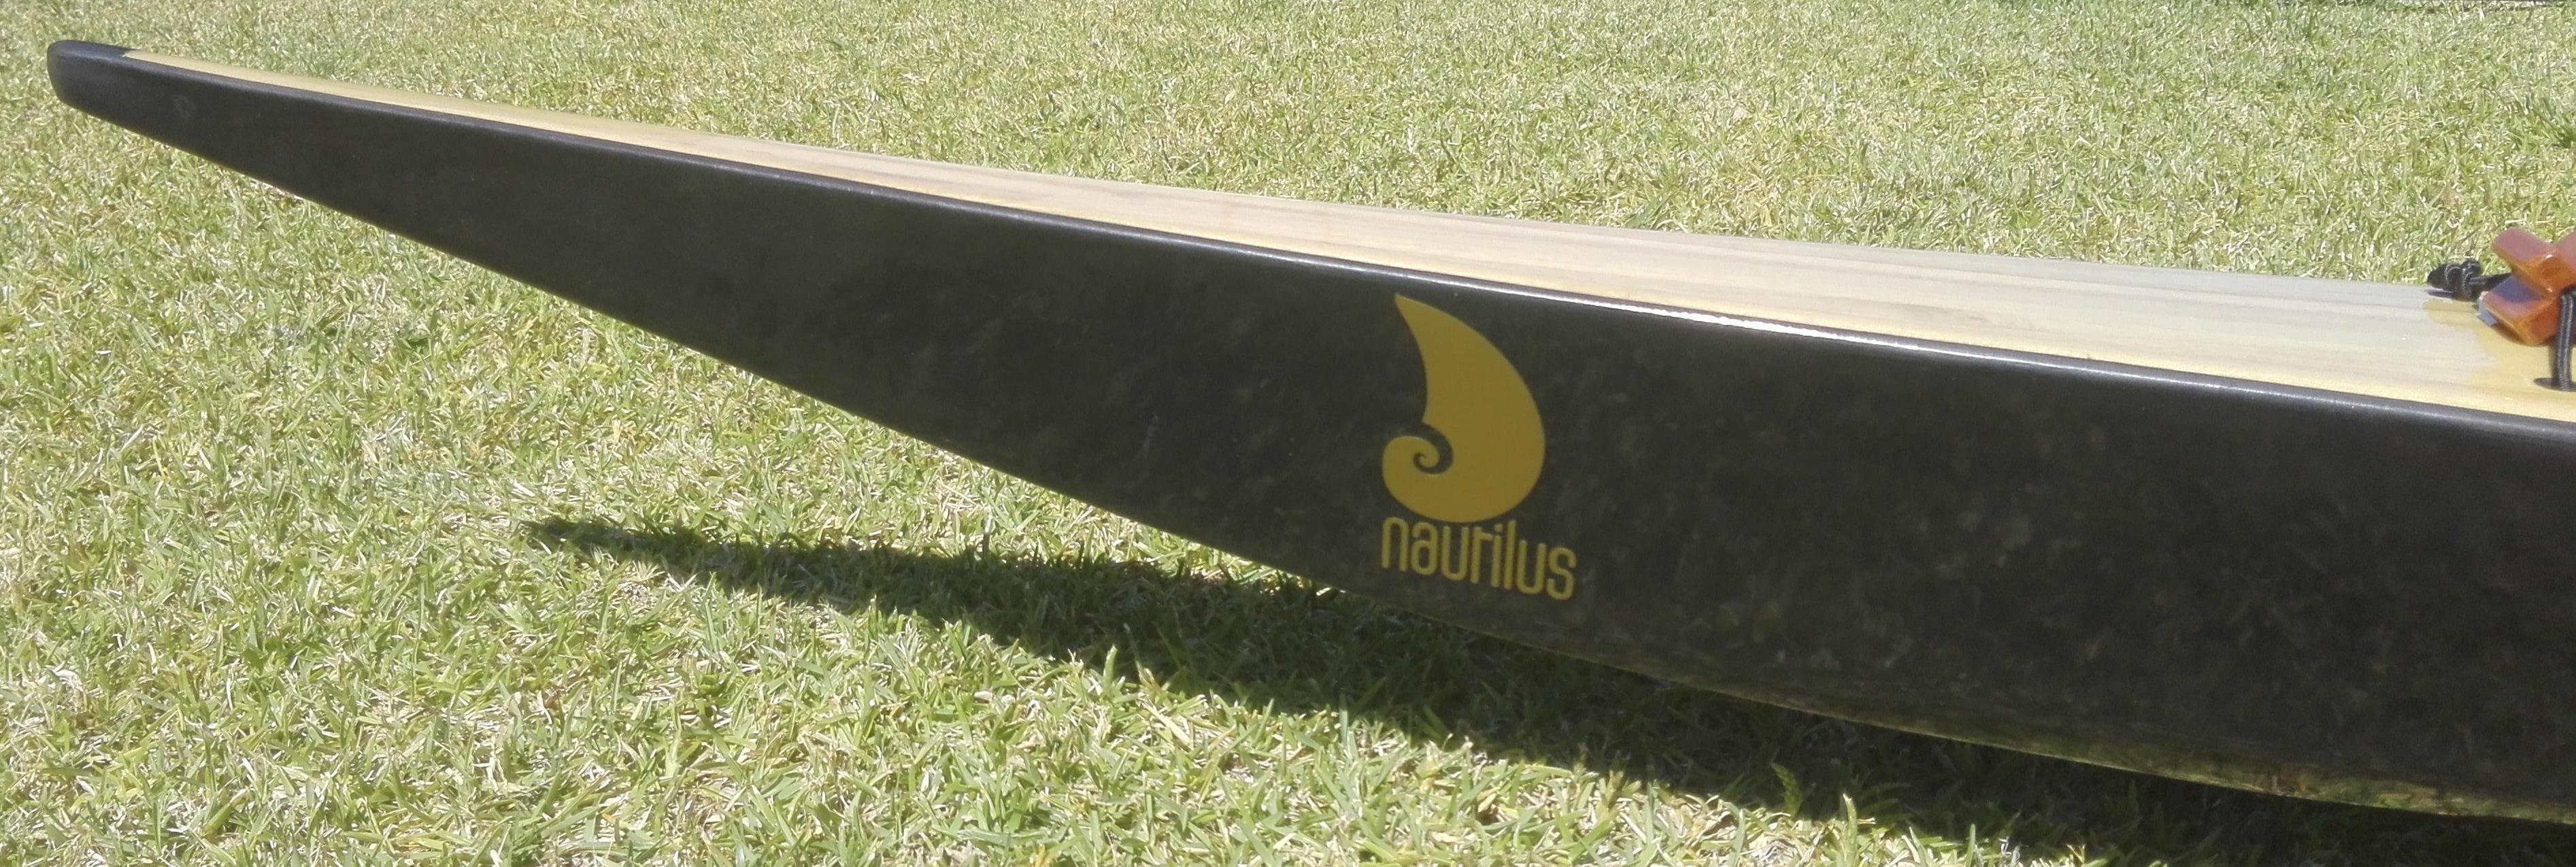 08 black pearl nautilus kayaks 25 (1)